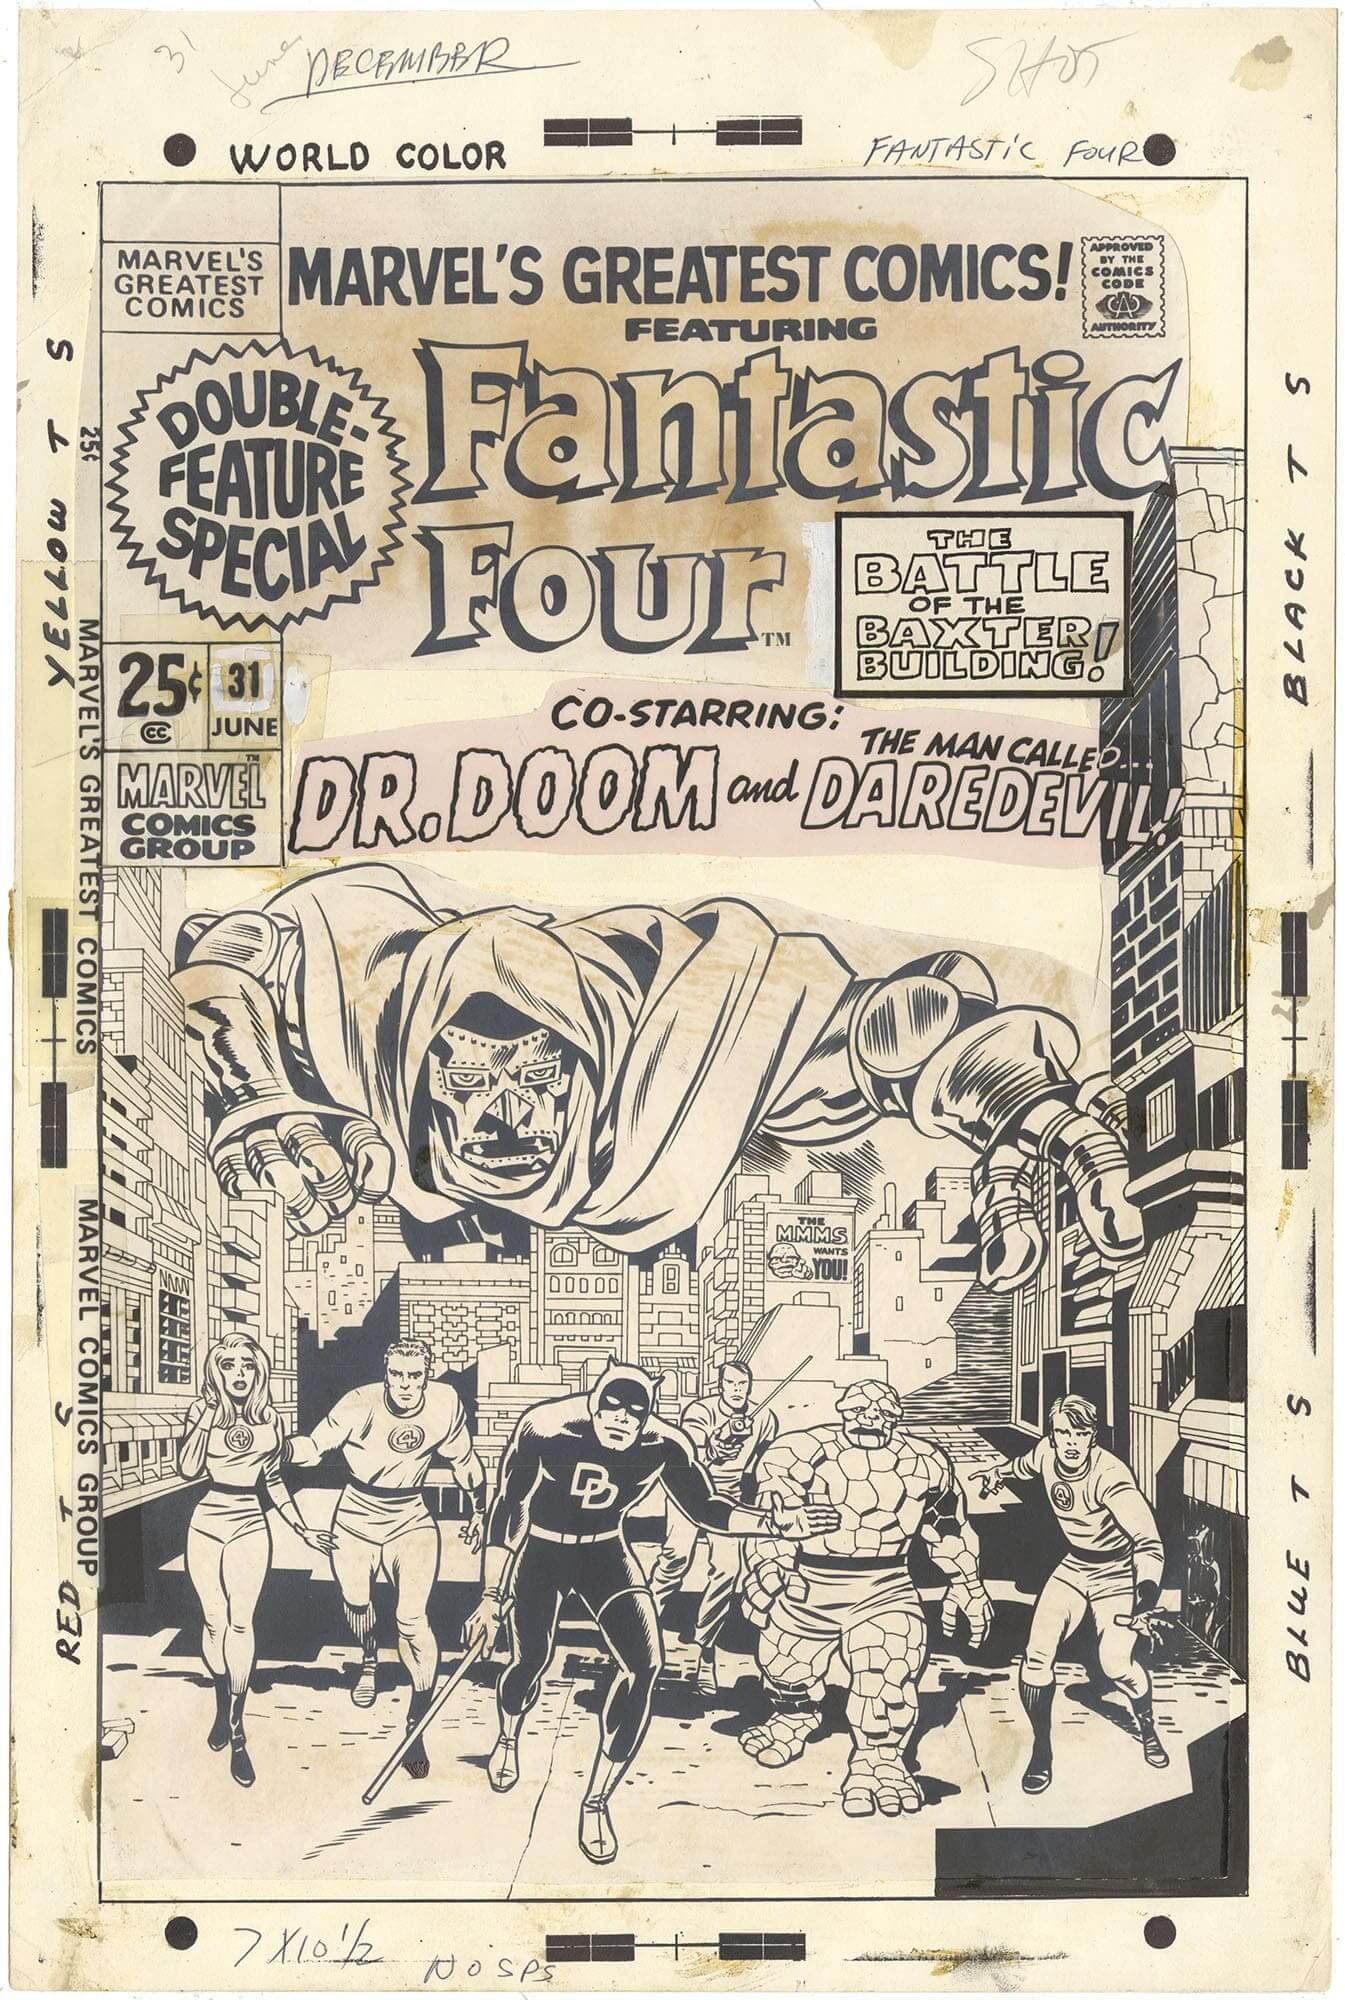 Marvel's Greatest Comics #31 Cover (Stat)